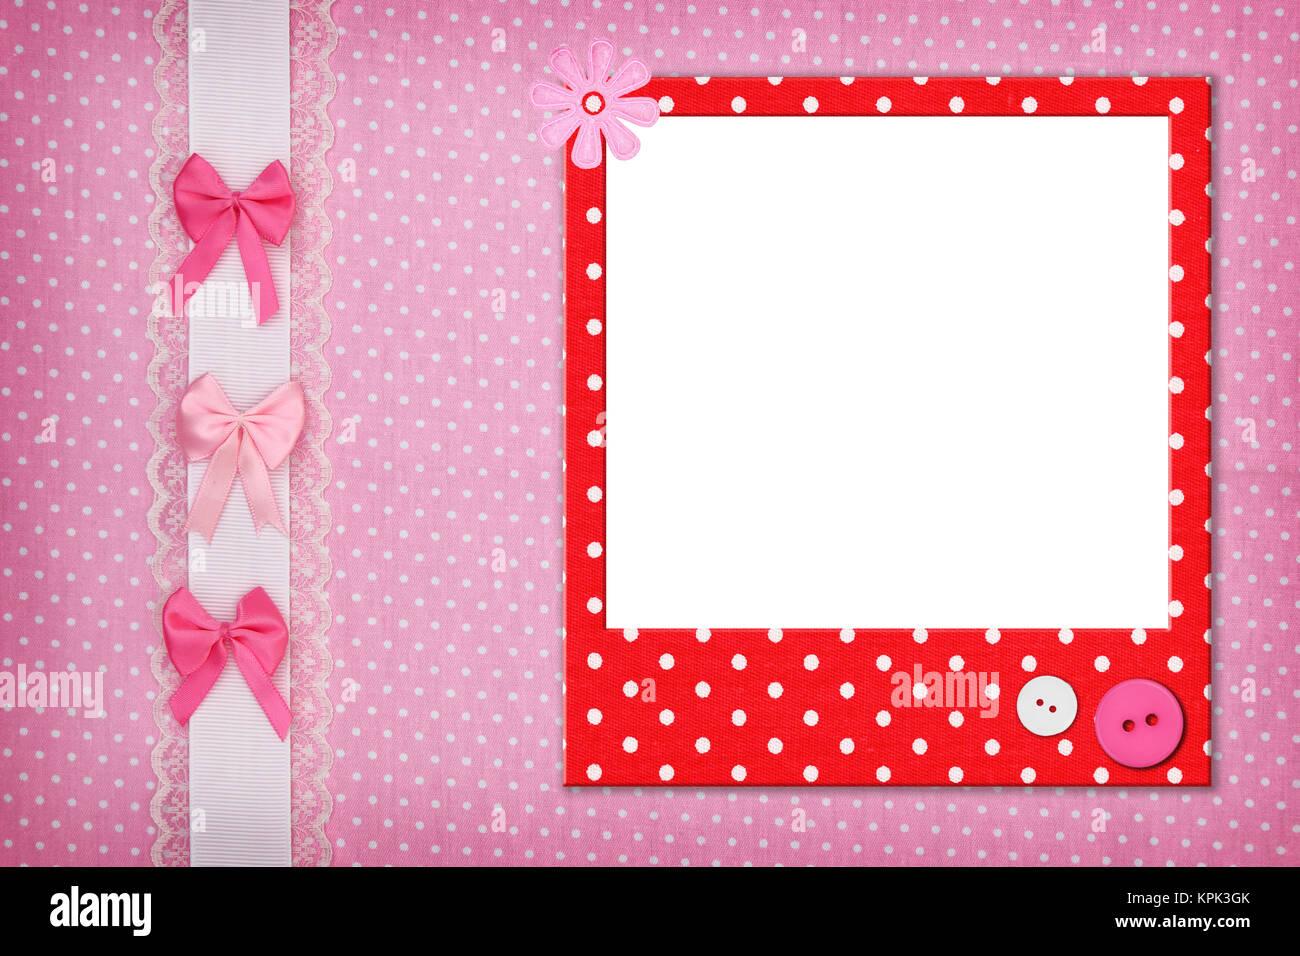 Photo frame on pink polka dot background Stock Photo: 168835651 - Alamy